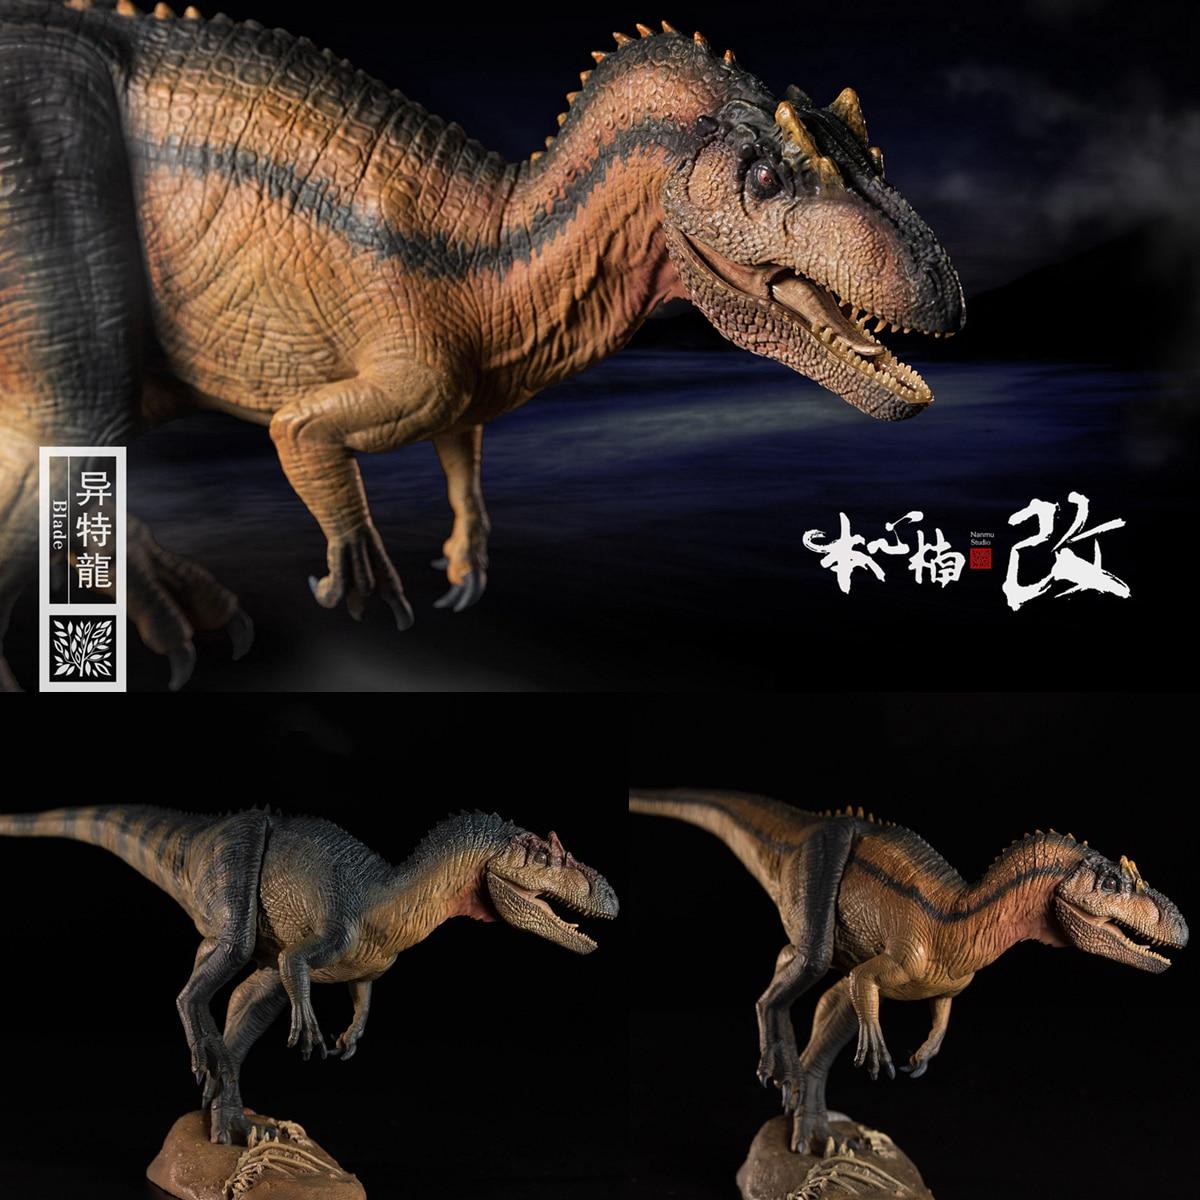 Nanmu 1/35 Allosaurus Figure Blade Dinosaur Animal Gift Jurassic Realistic Dinosaur Figure PVC Model Toys Collector Pre-order